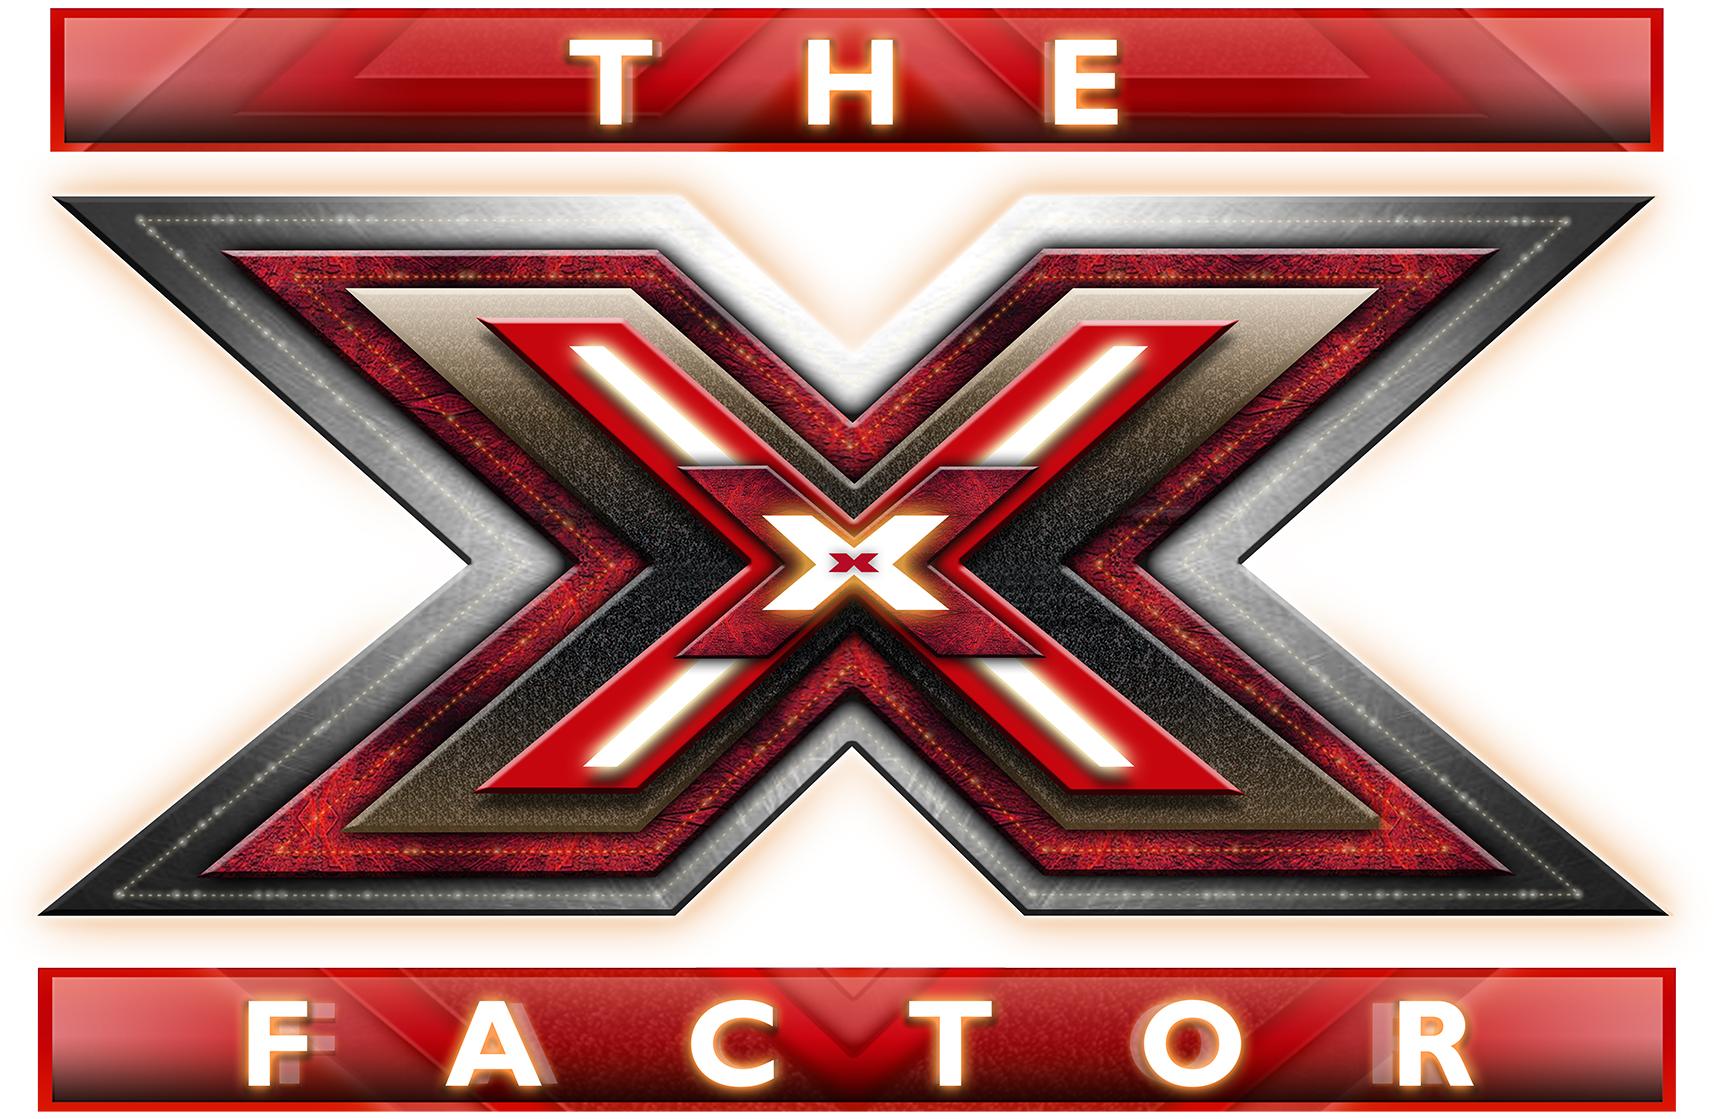 The X Factor (UK TV series).